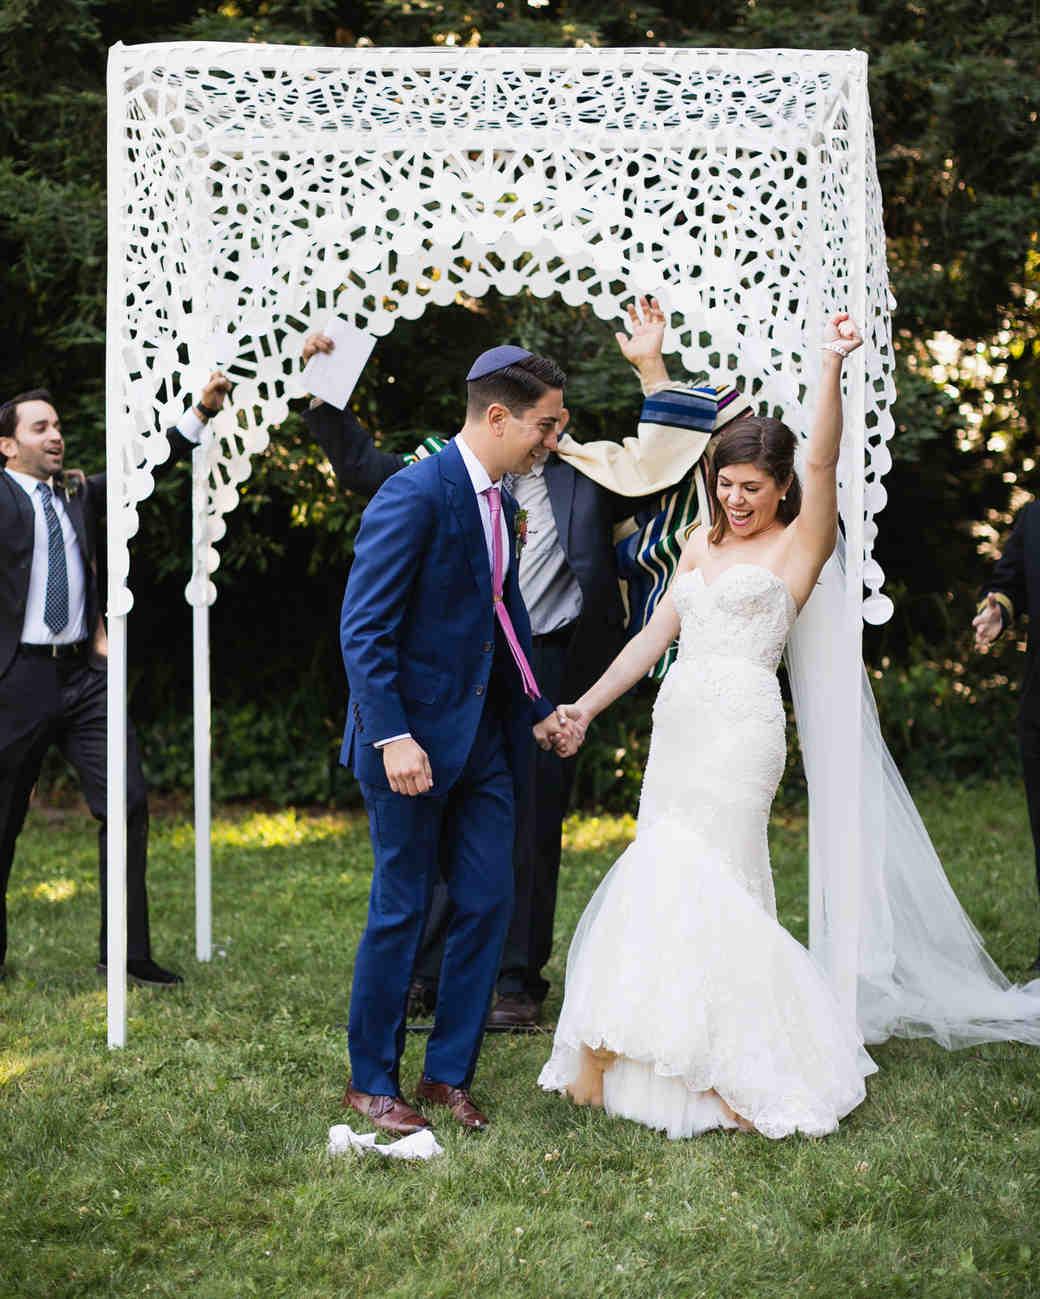 molly adam wedding ceremony glass